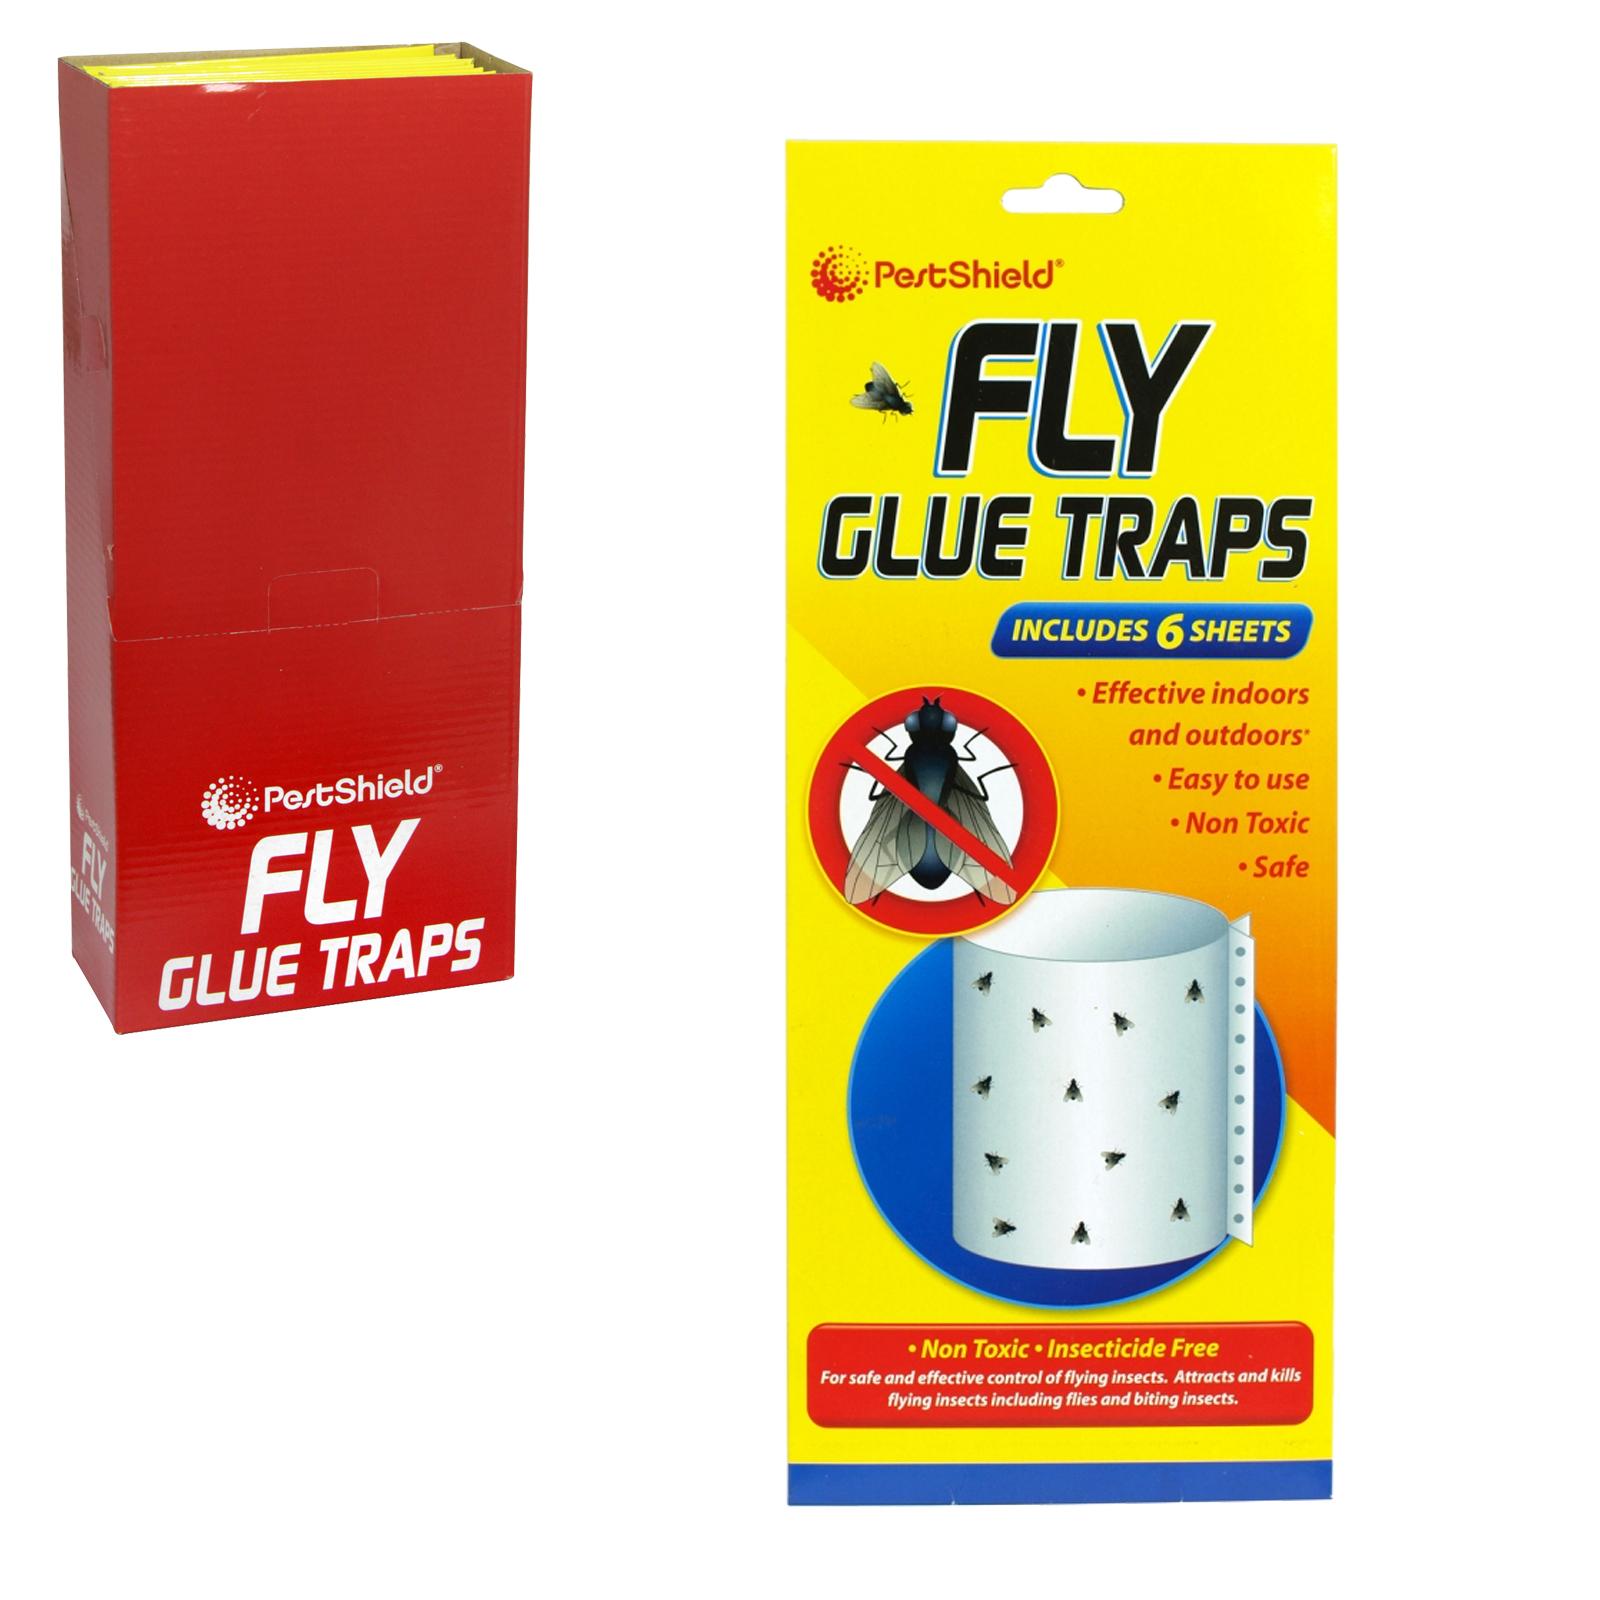 PESTSHEILD 4PK FLY GLUE TRAPS X12